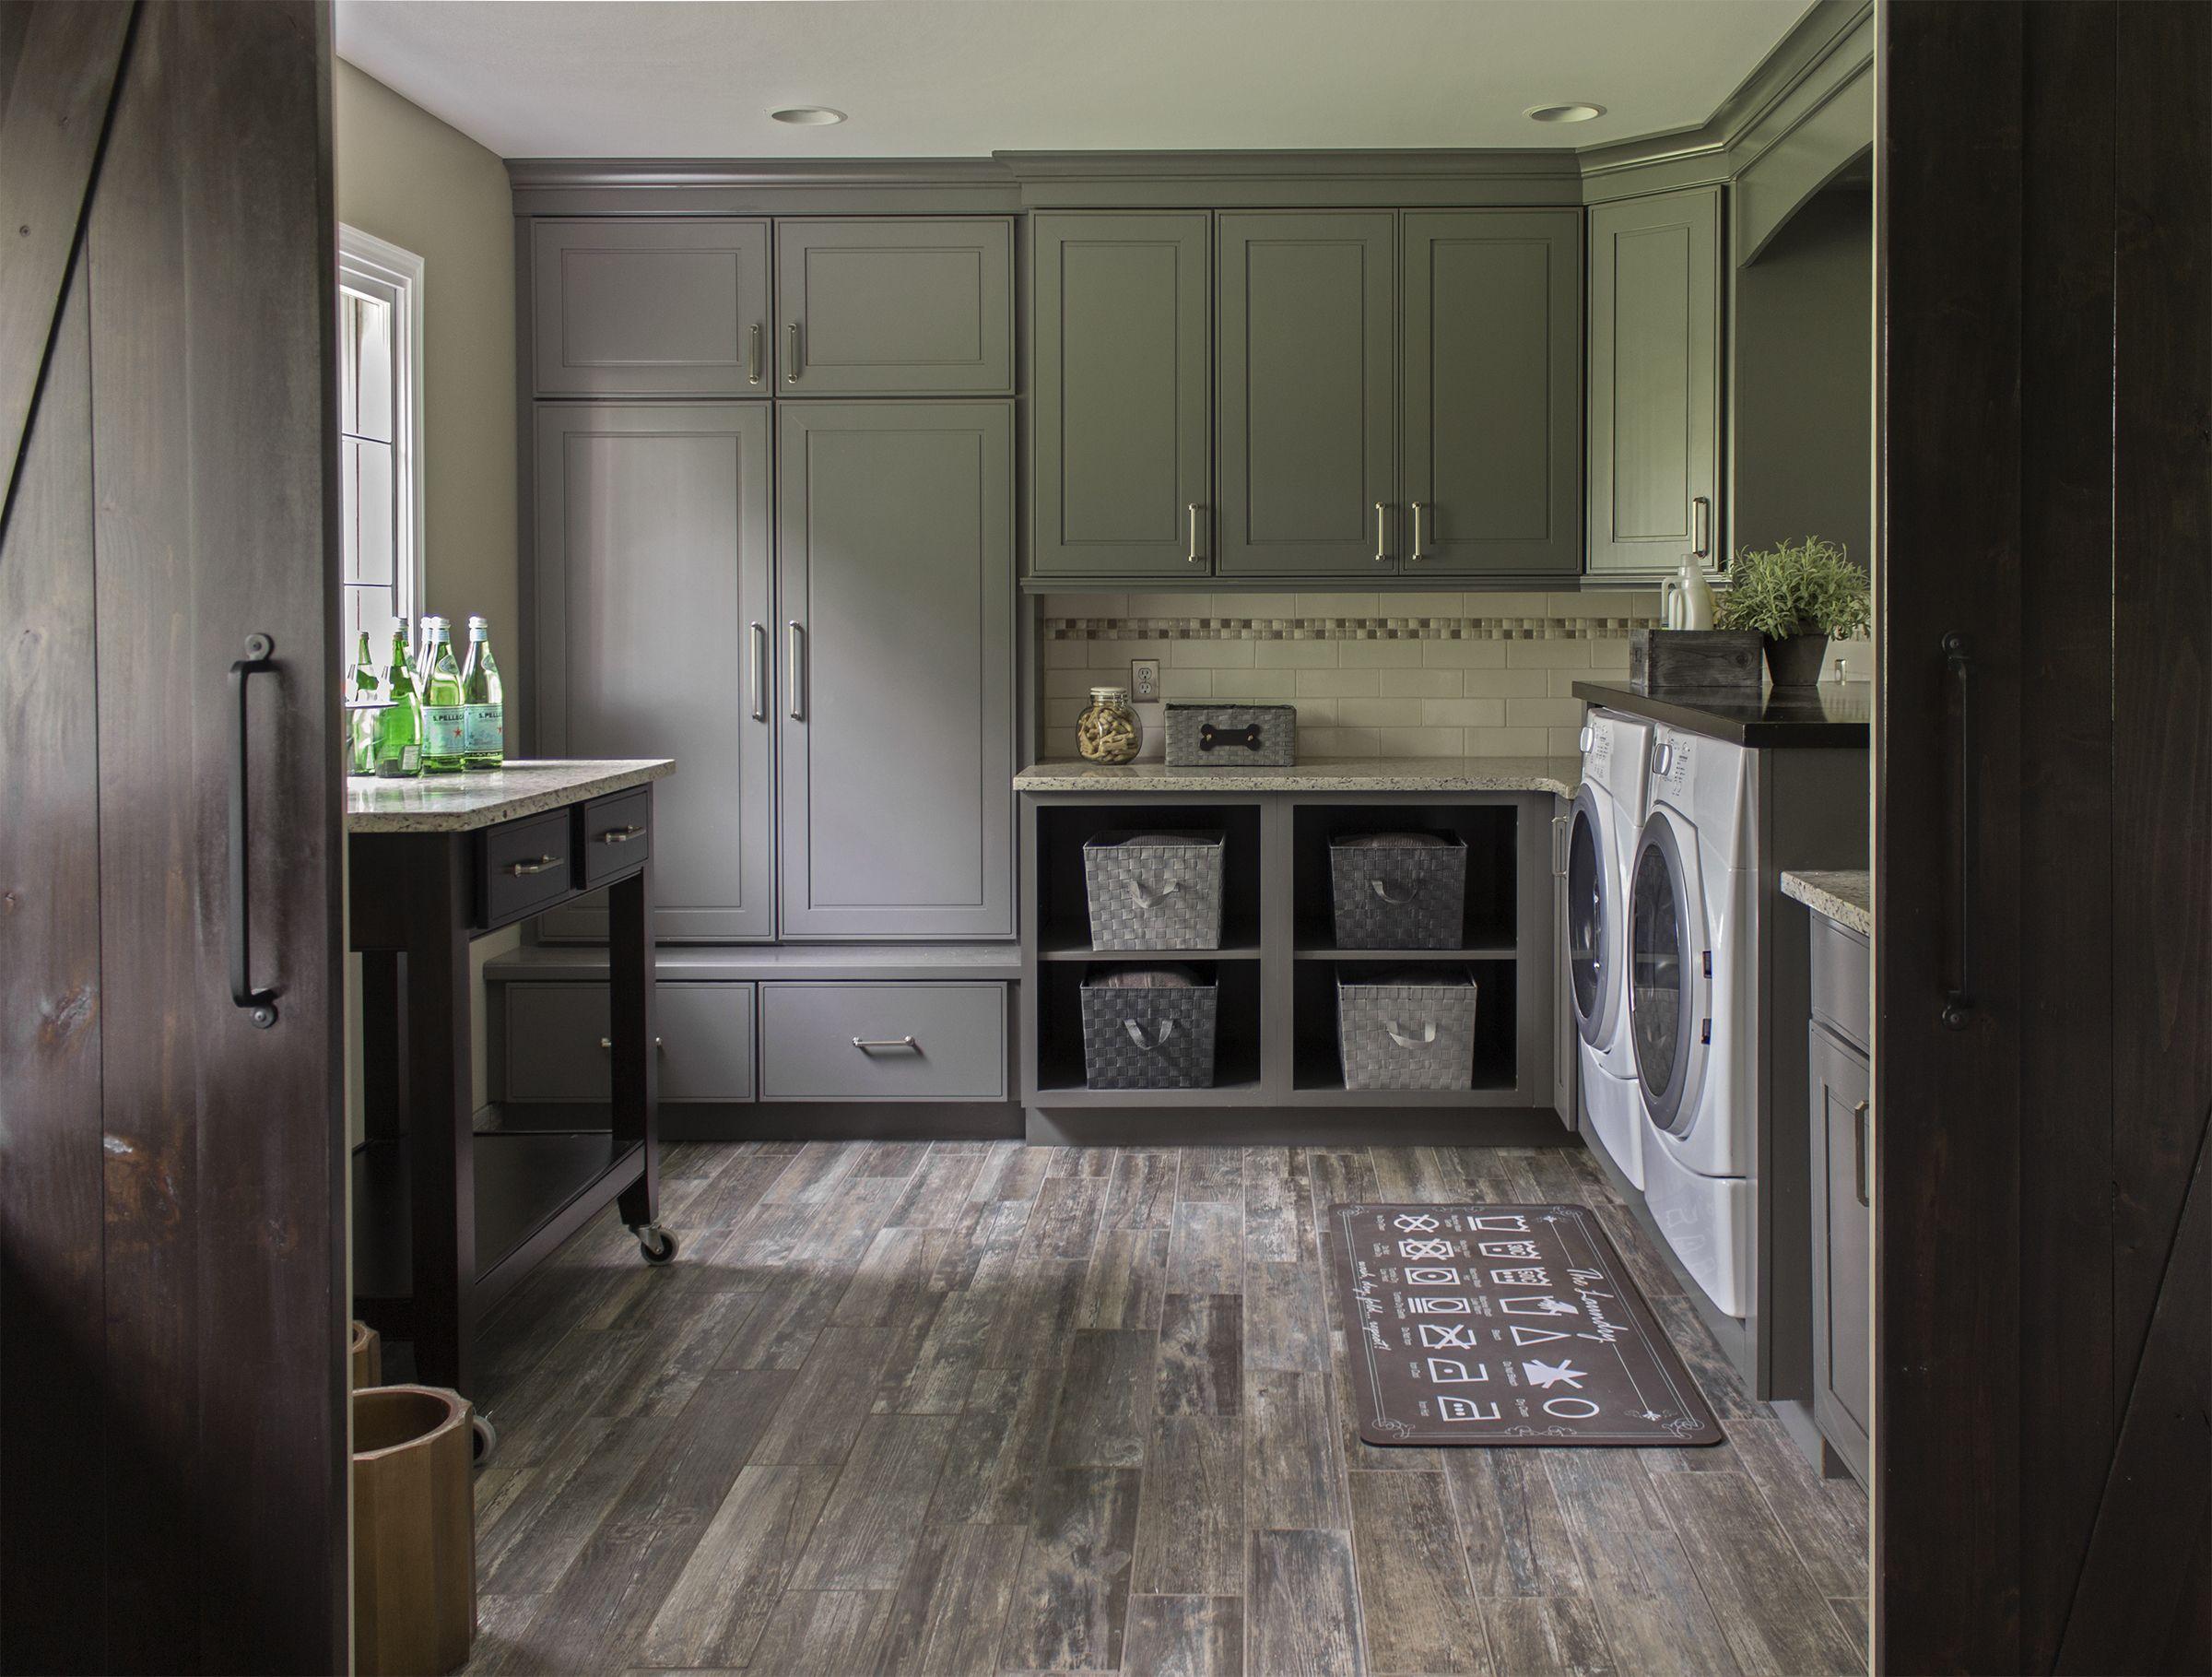 Photo Courtesy Of Jennifer Wilson Ksi Designer Merillat Masterpiece Gallina Maple In Greyloft Laundry Mud Room